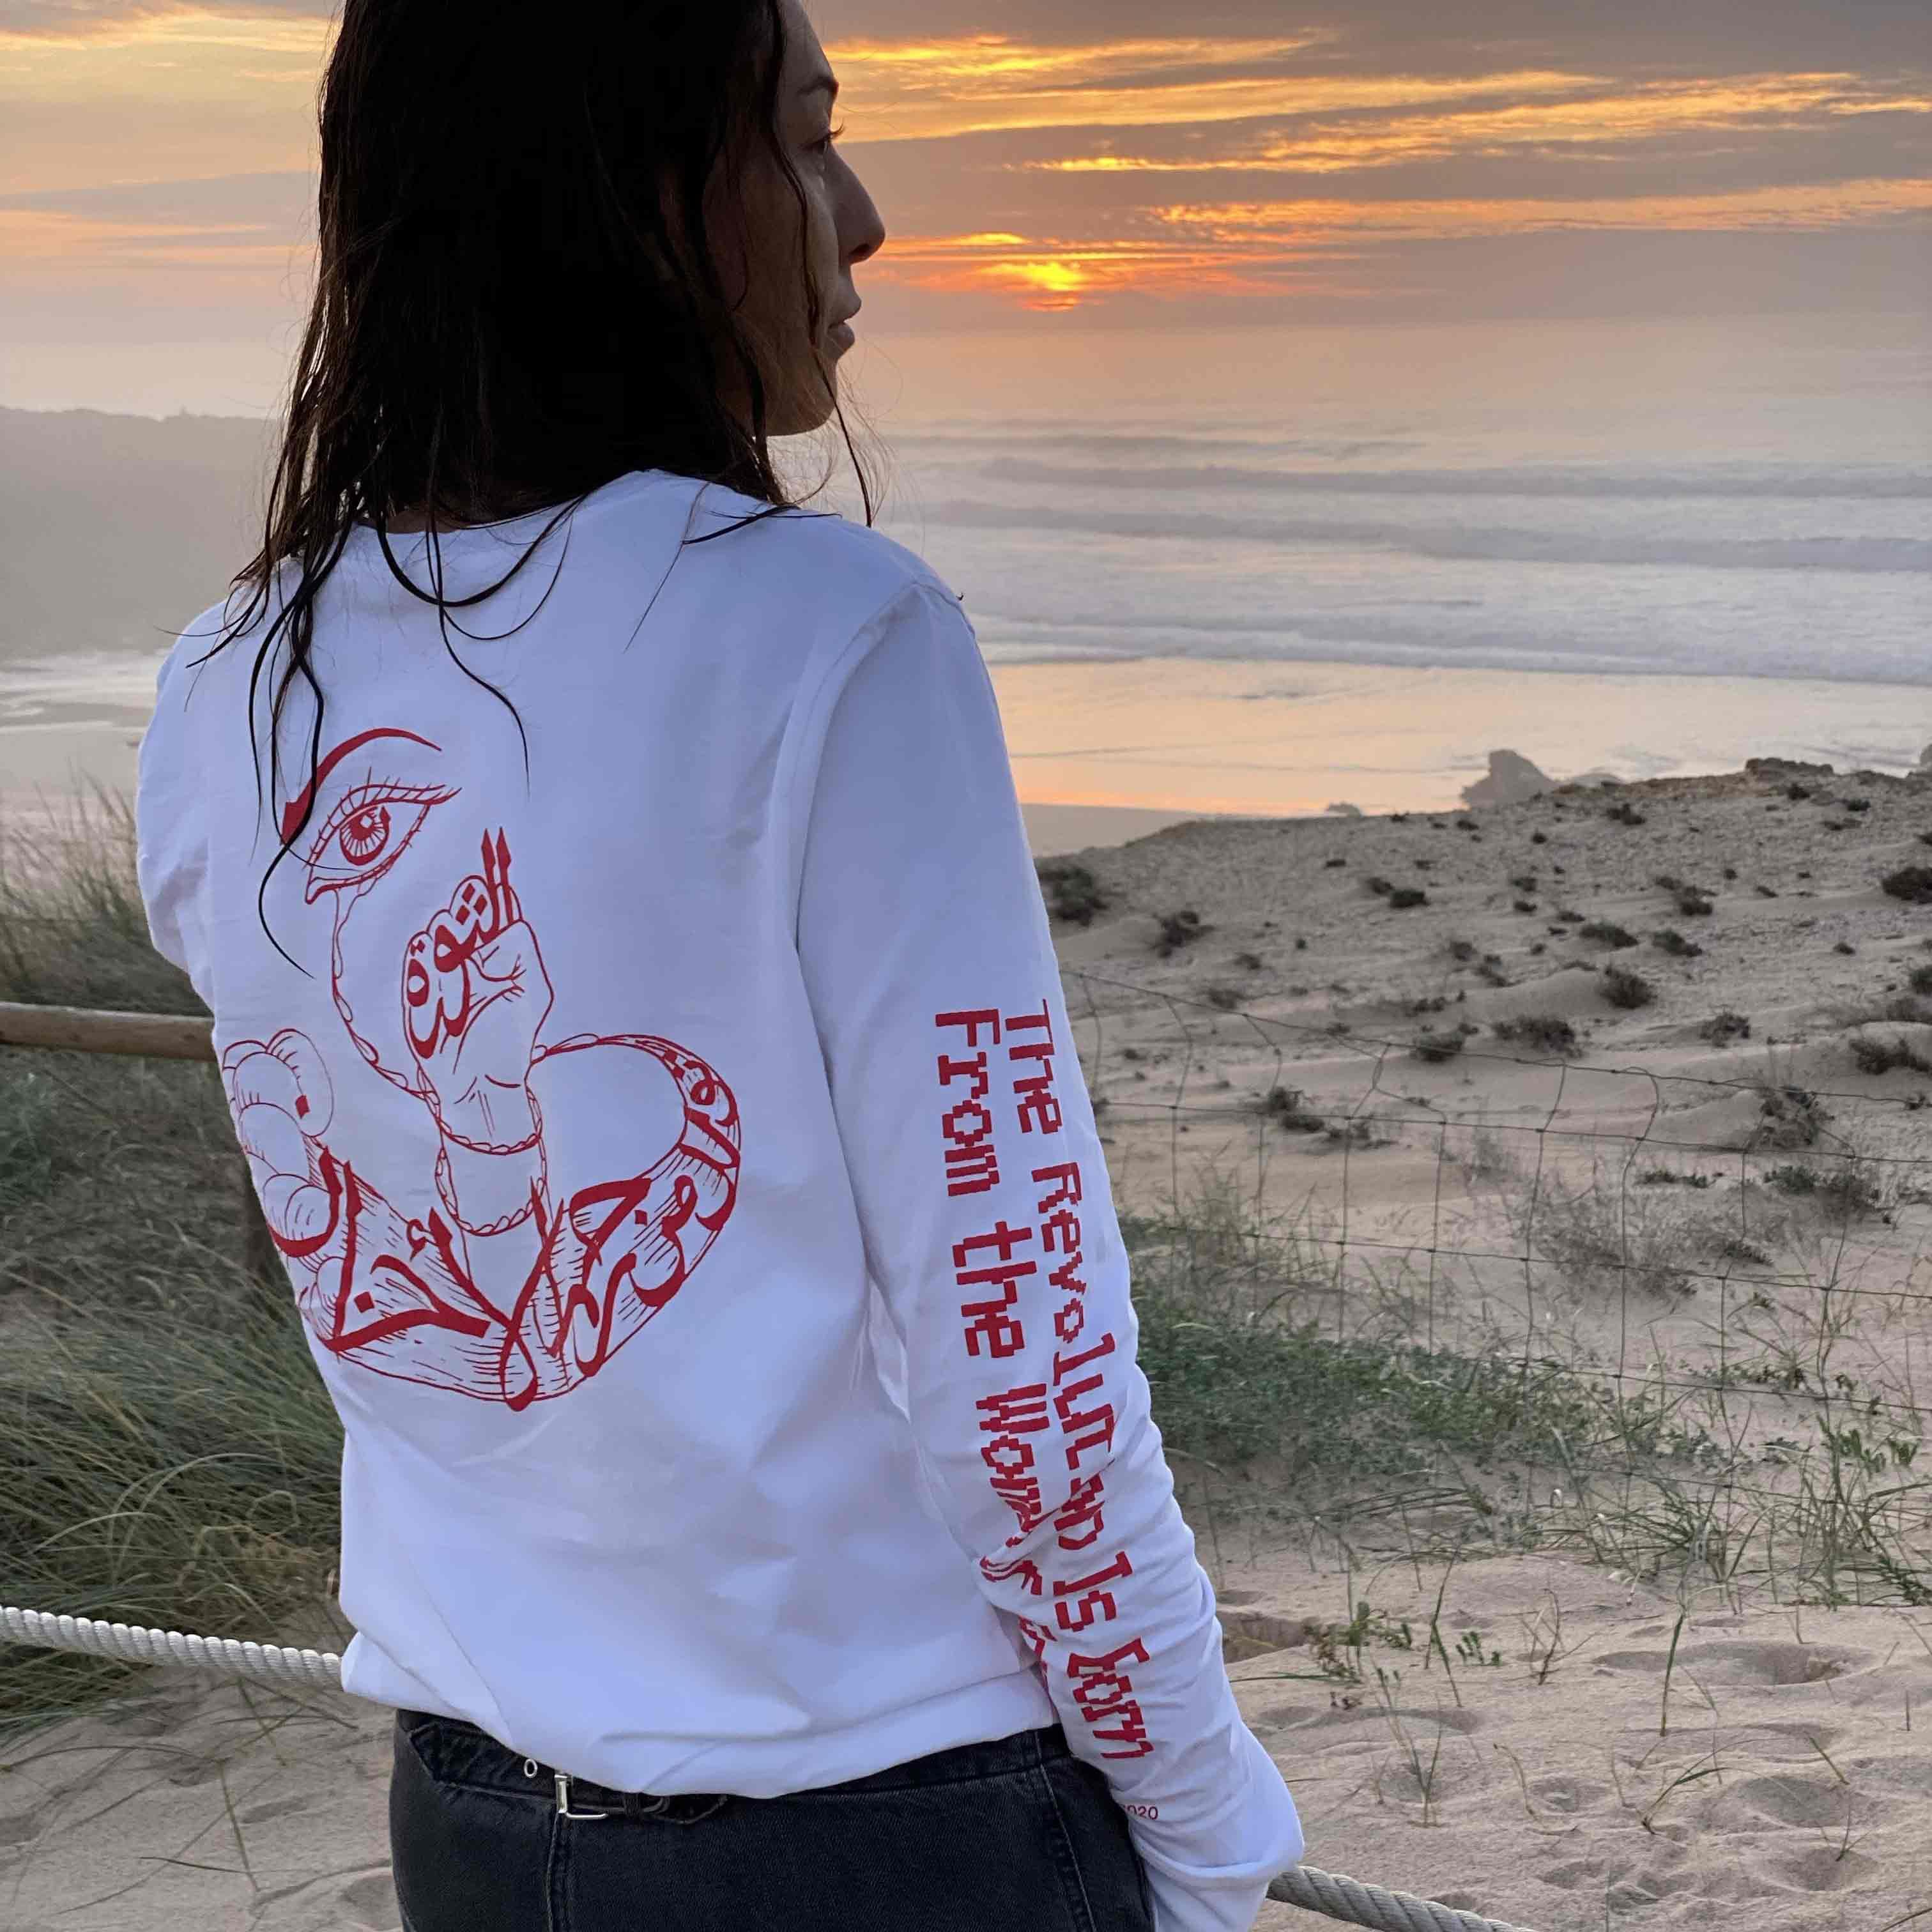 Everpress-blog-20-favourite-t-shirt-designs-2020-the-revolution-is-born-michael-challita-iman-raad